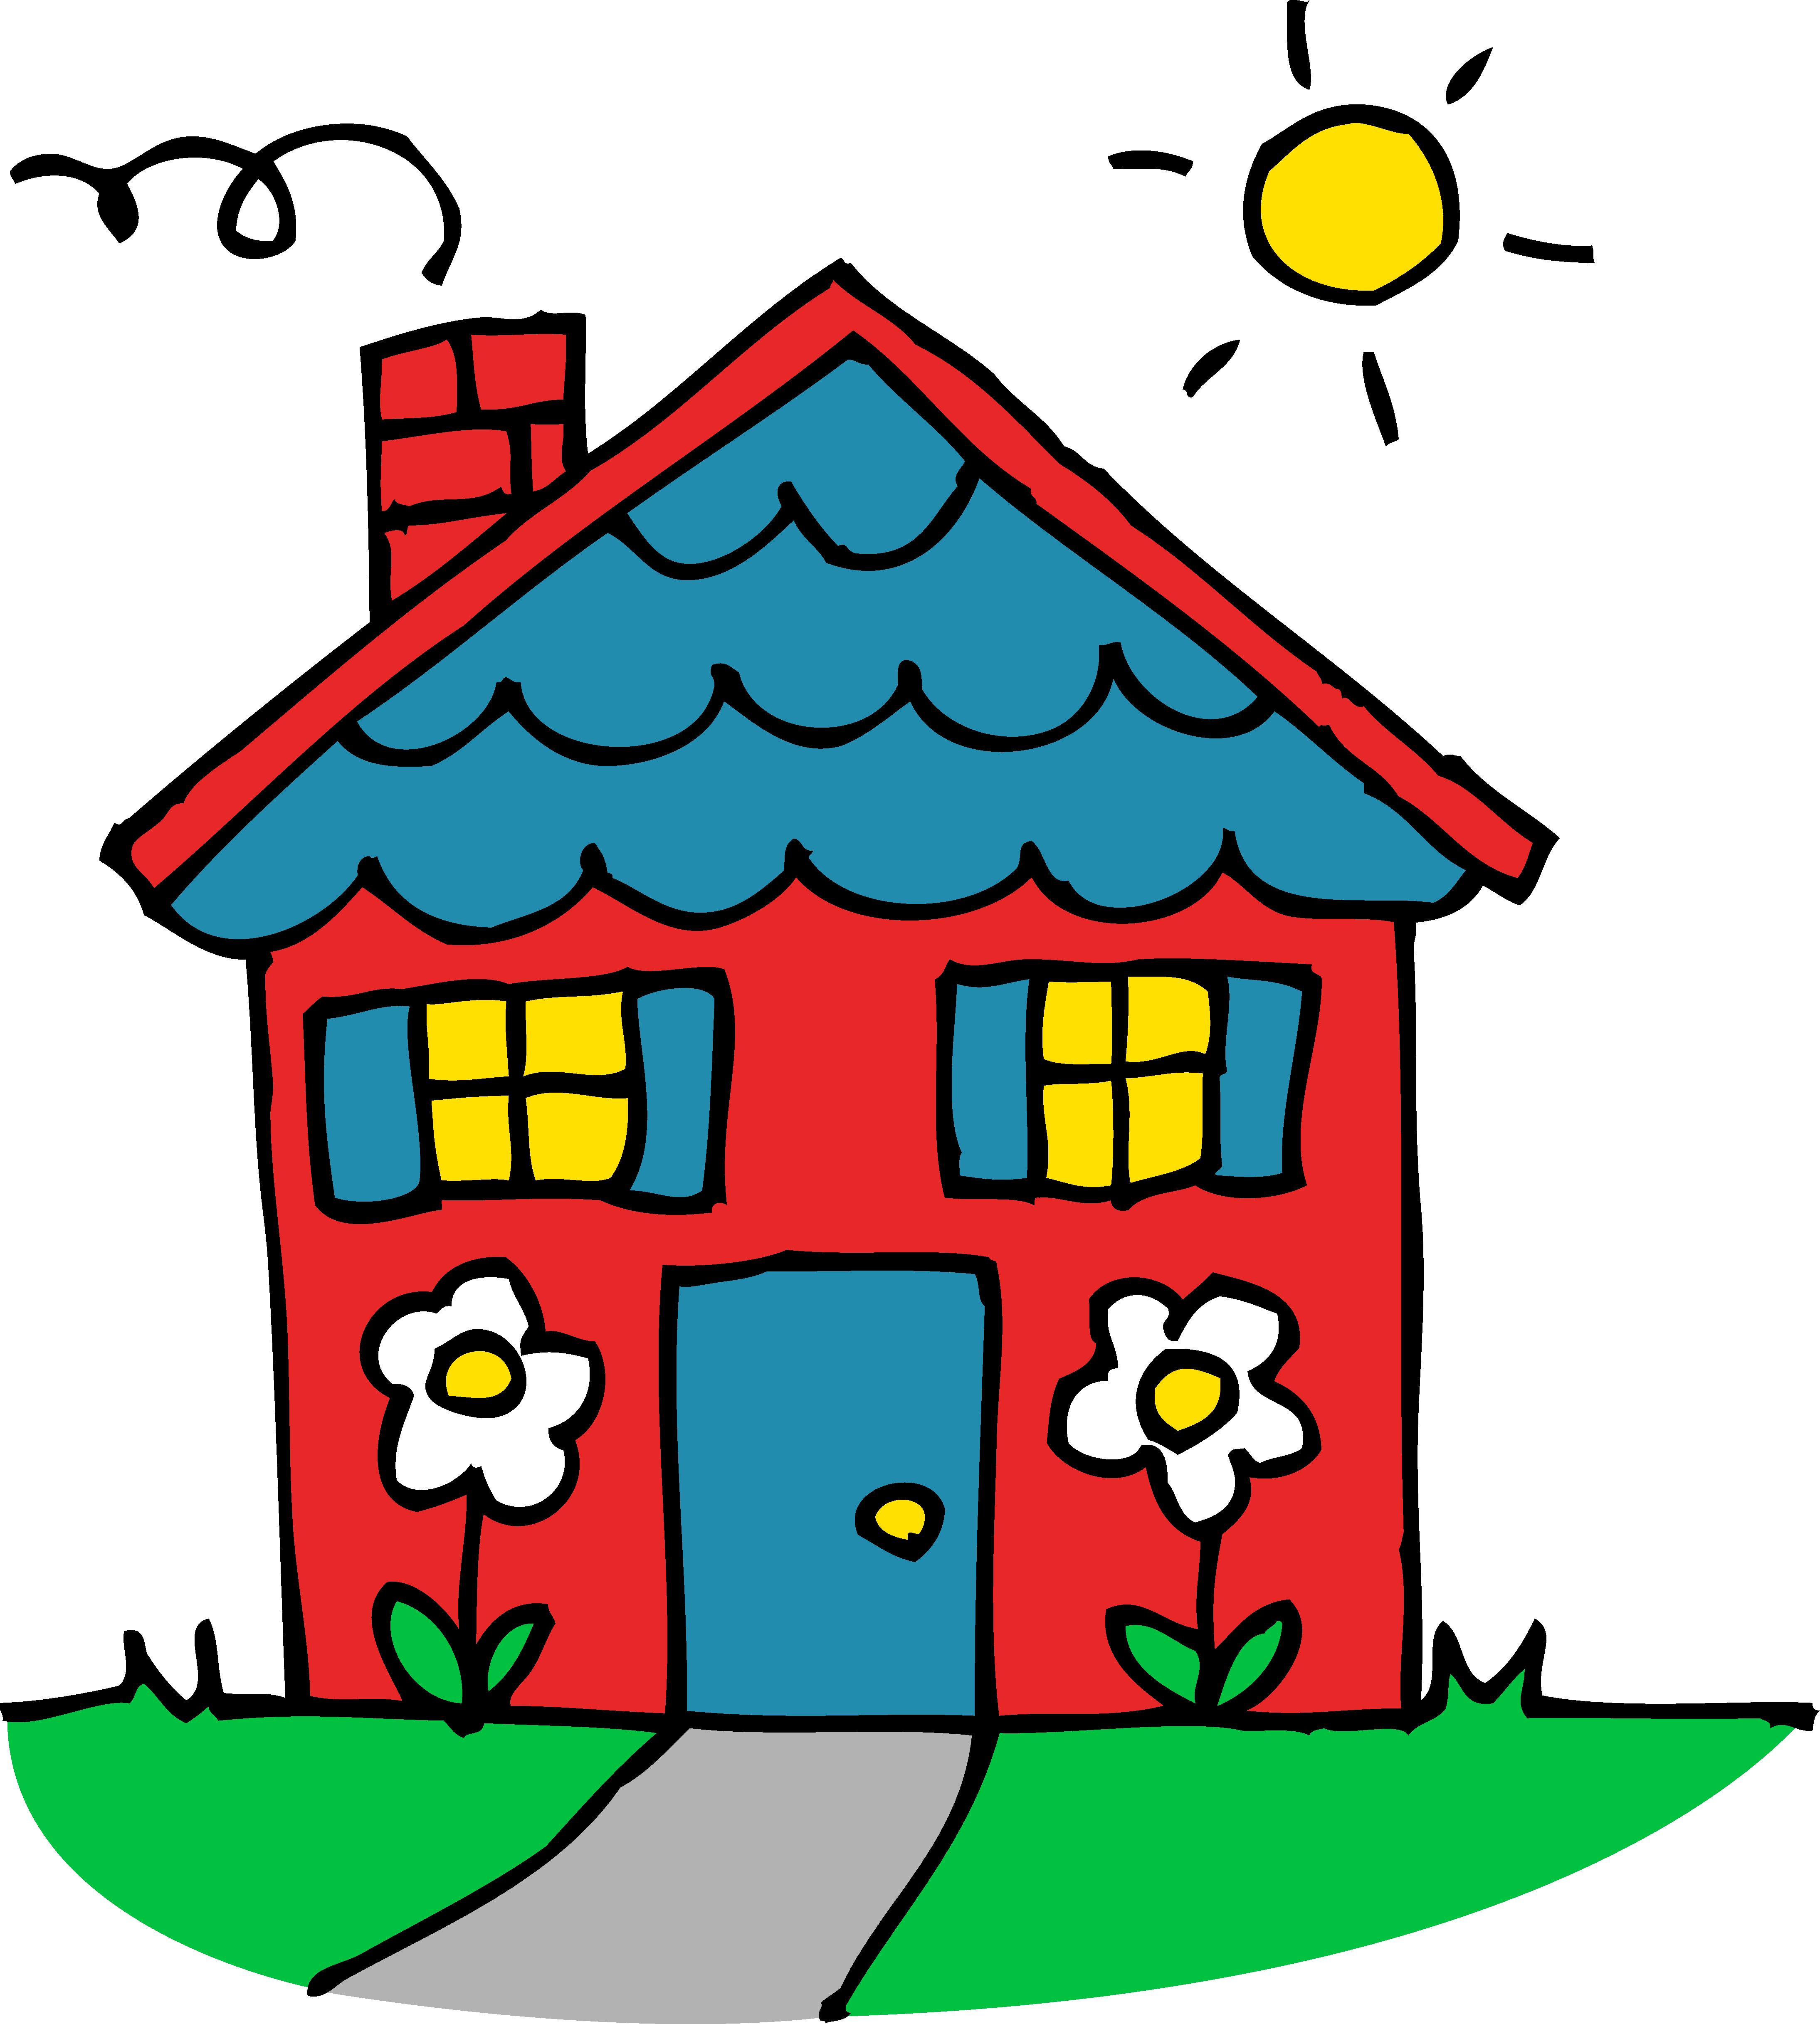 House Clipart-house clipart-7